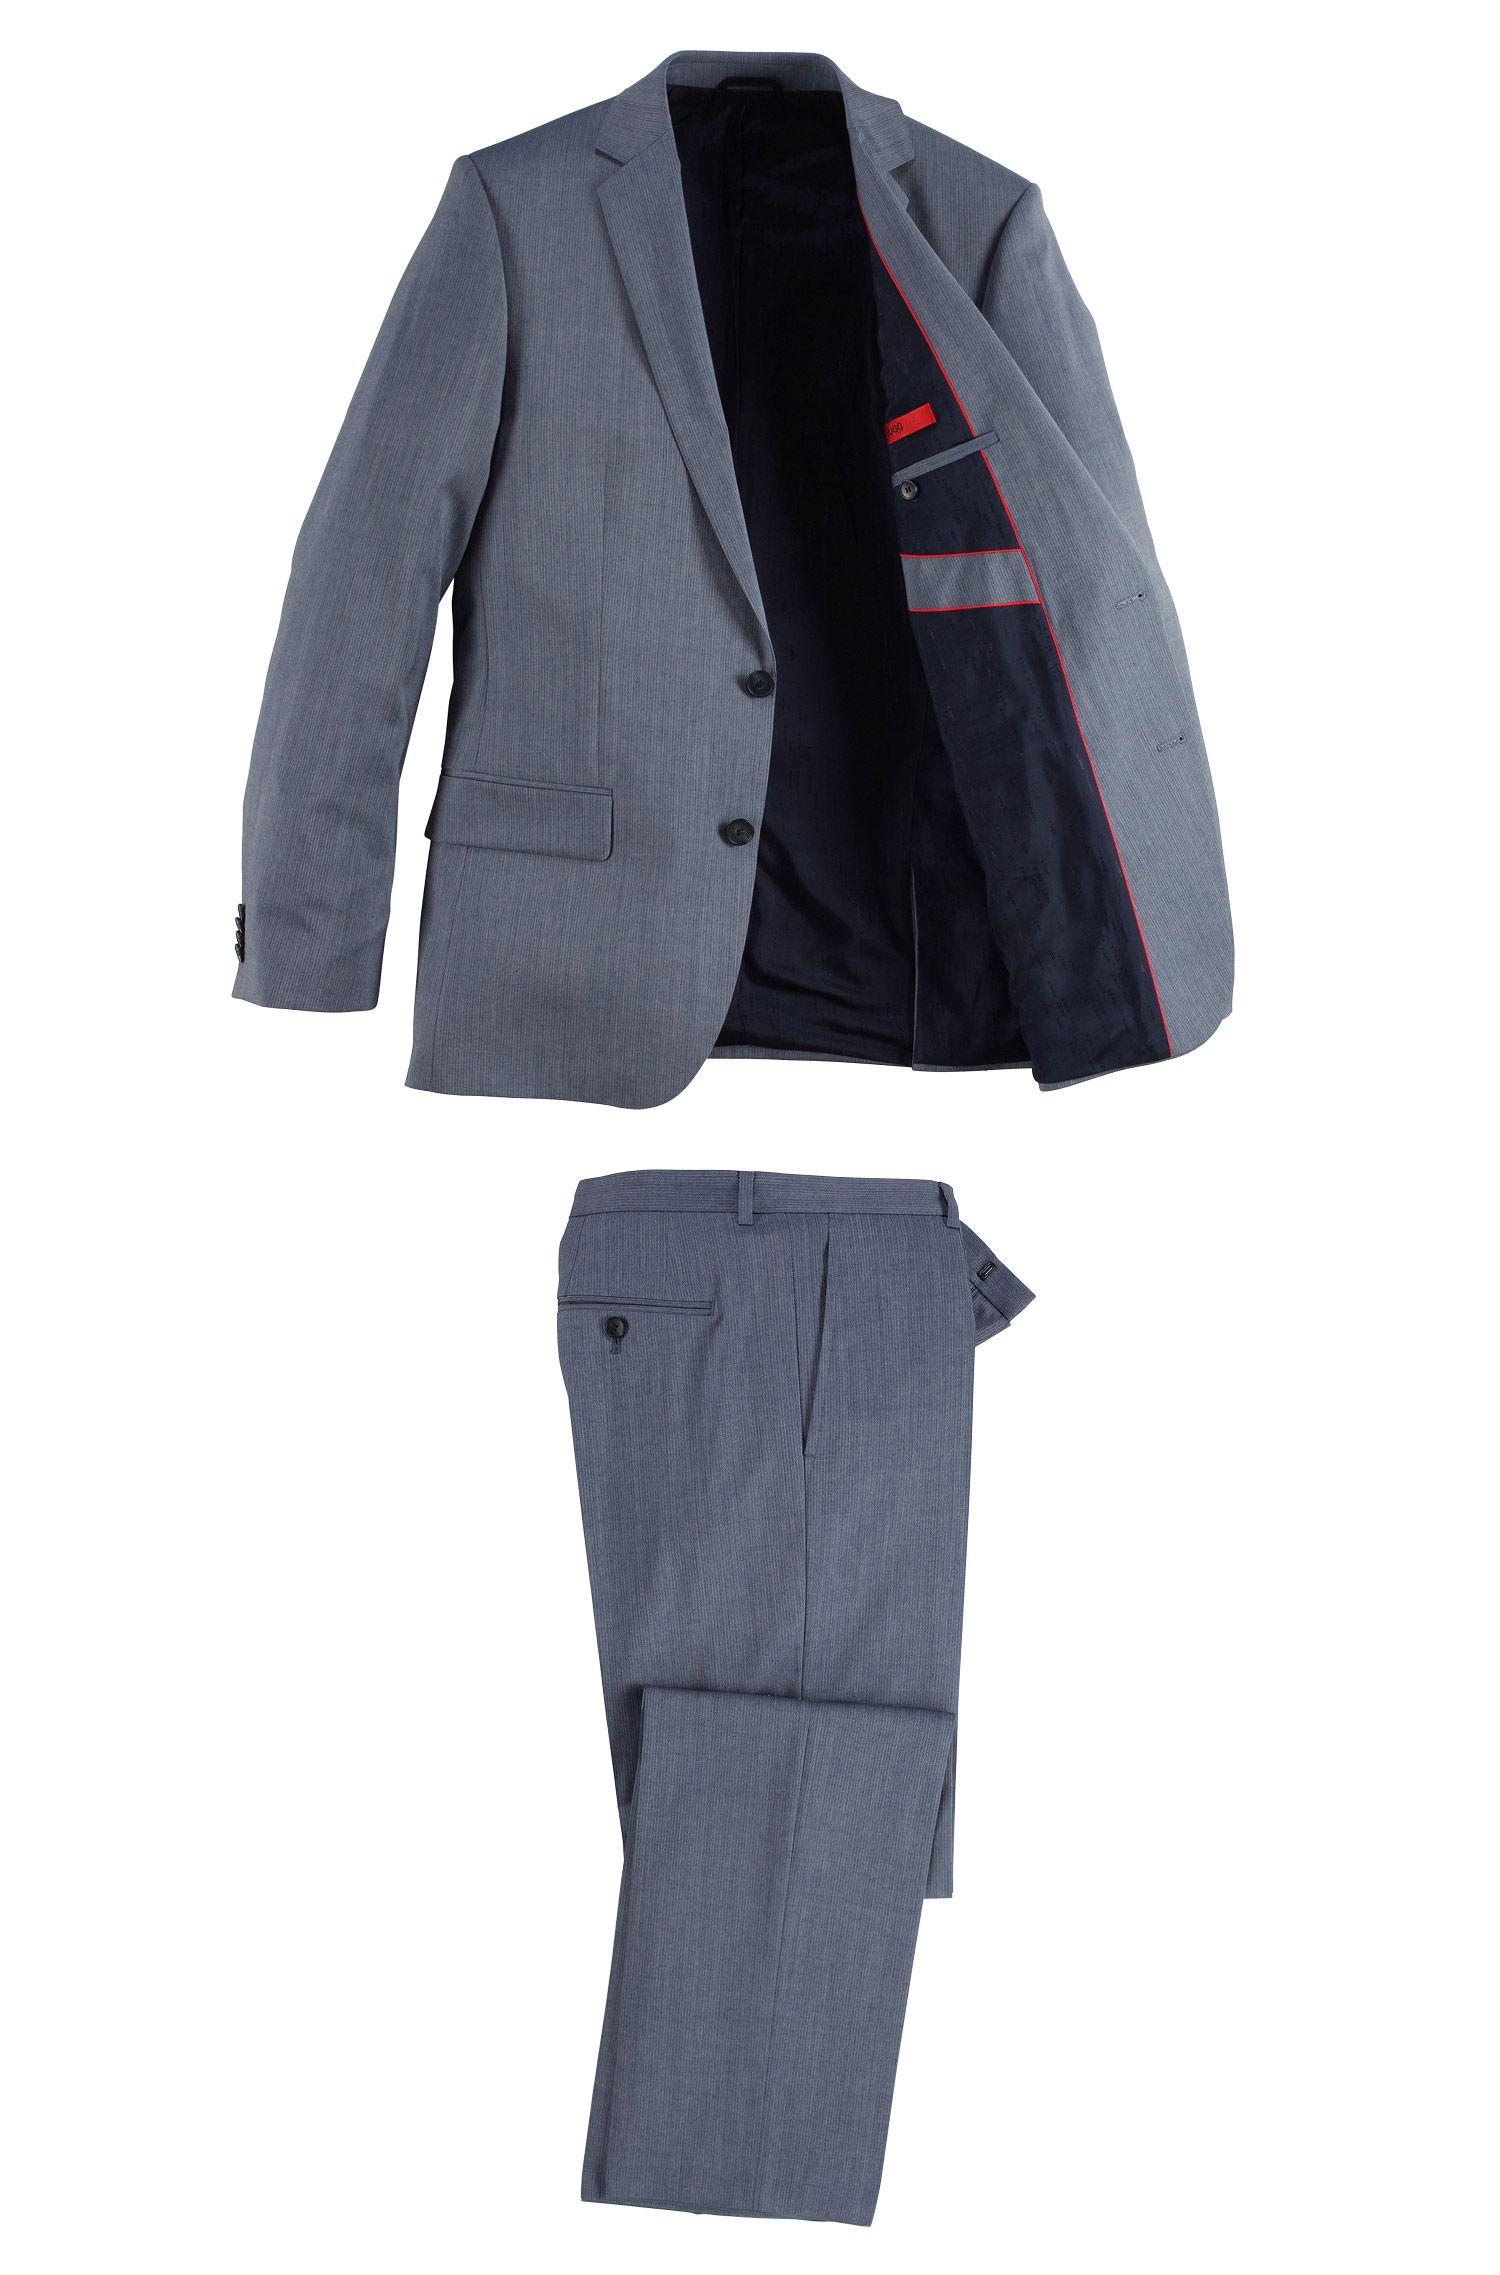 Costume Slim Fit en laine vierge, Amaro/Heise